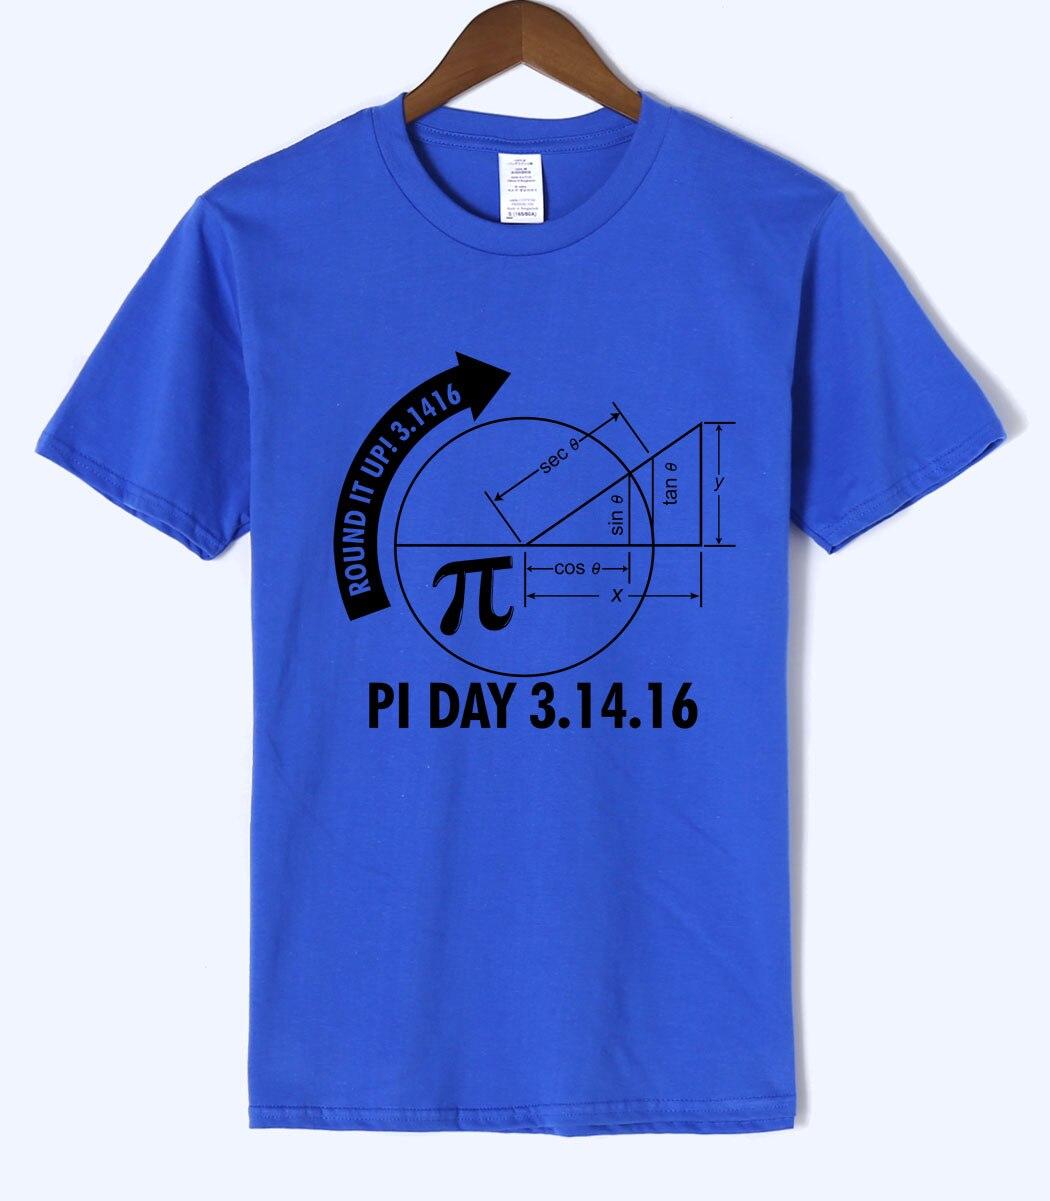 Pi Day 3.1416 Round It Up Math Graph 2018 Summer New Style Mens T Shirts 100% Cotton High Quality Short Sleeve Harajuku T-Shirts